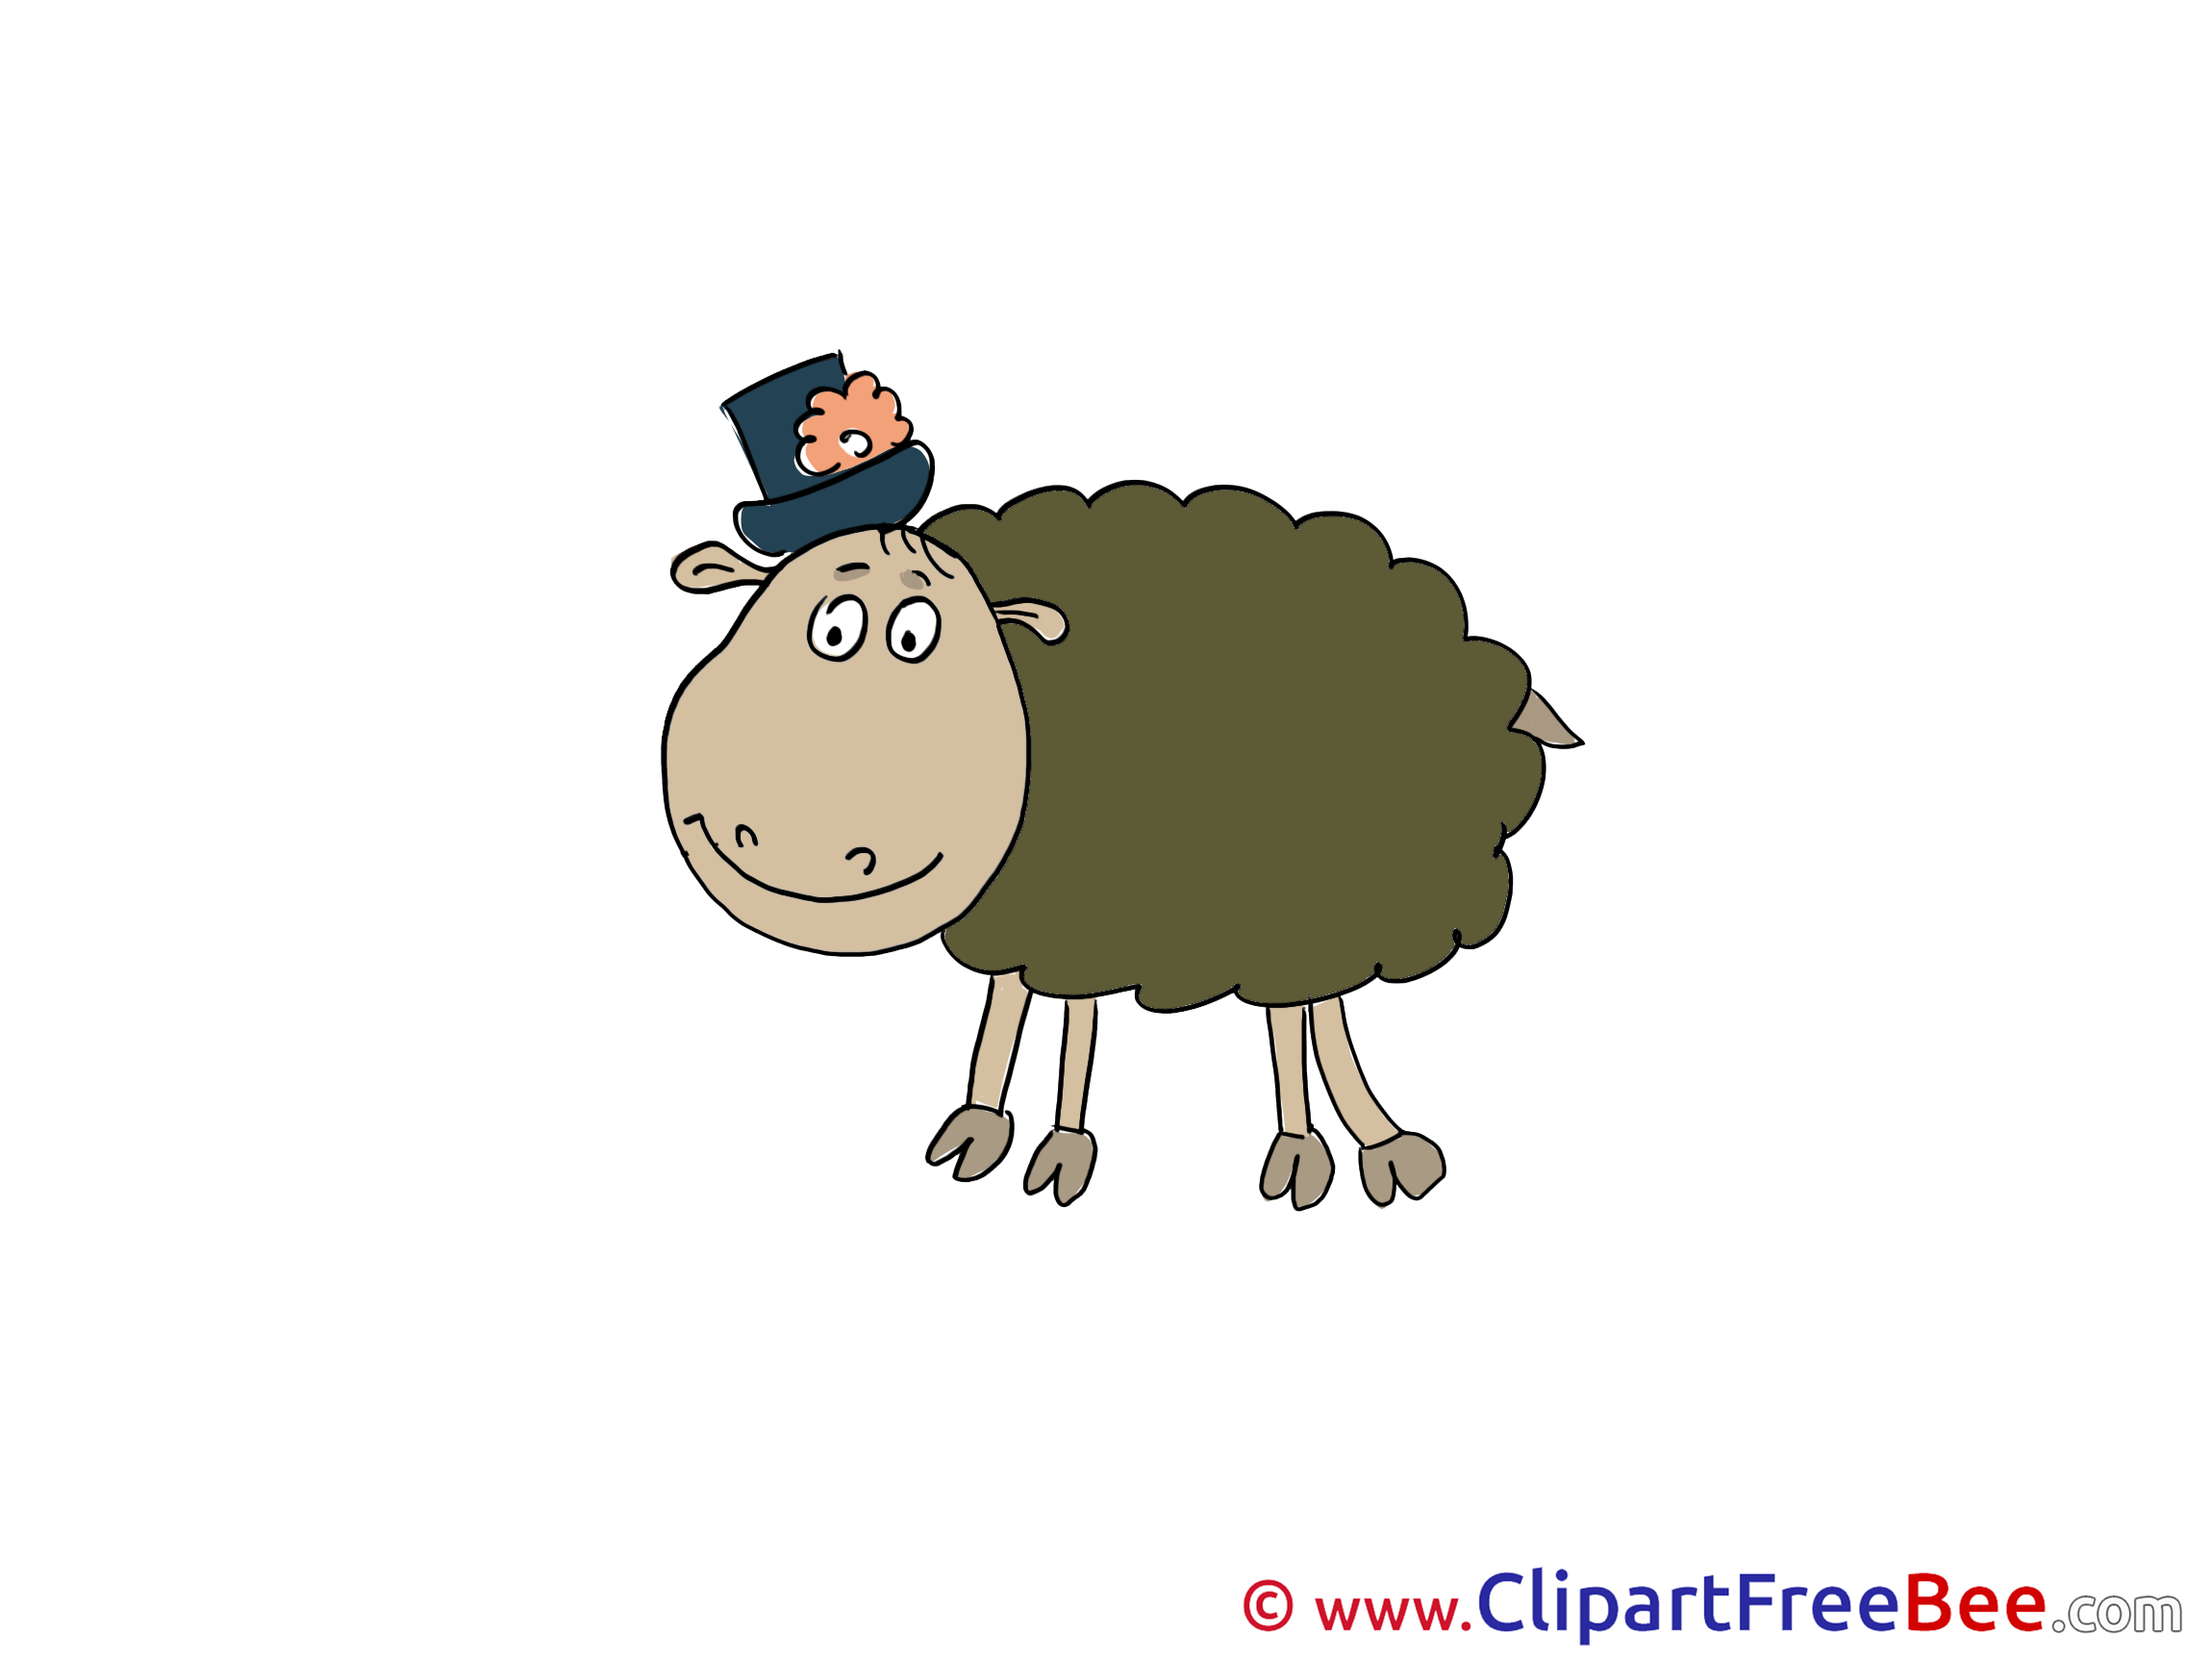 Hat Sheep Pics free download Image